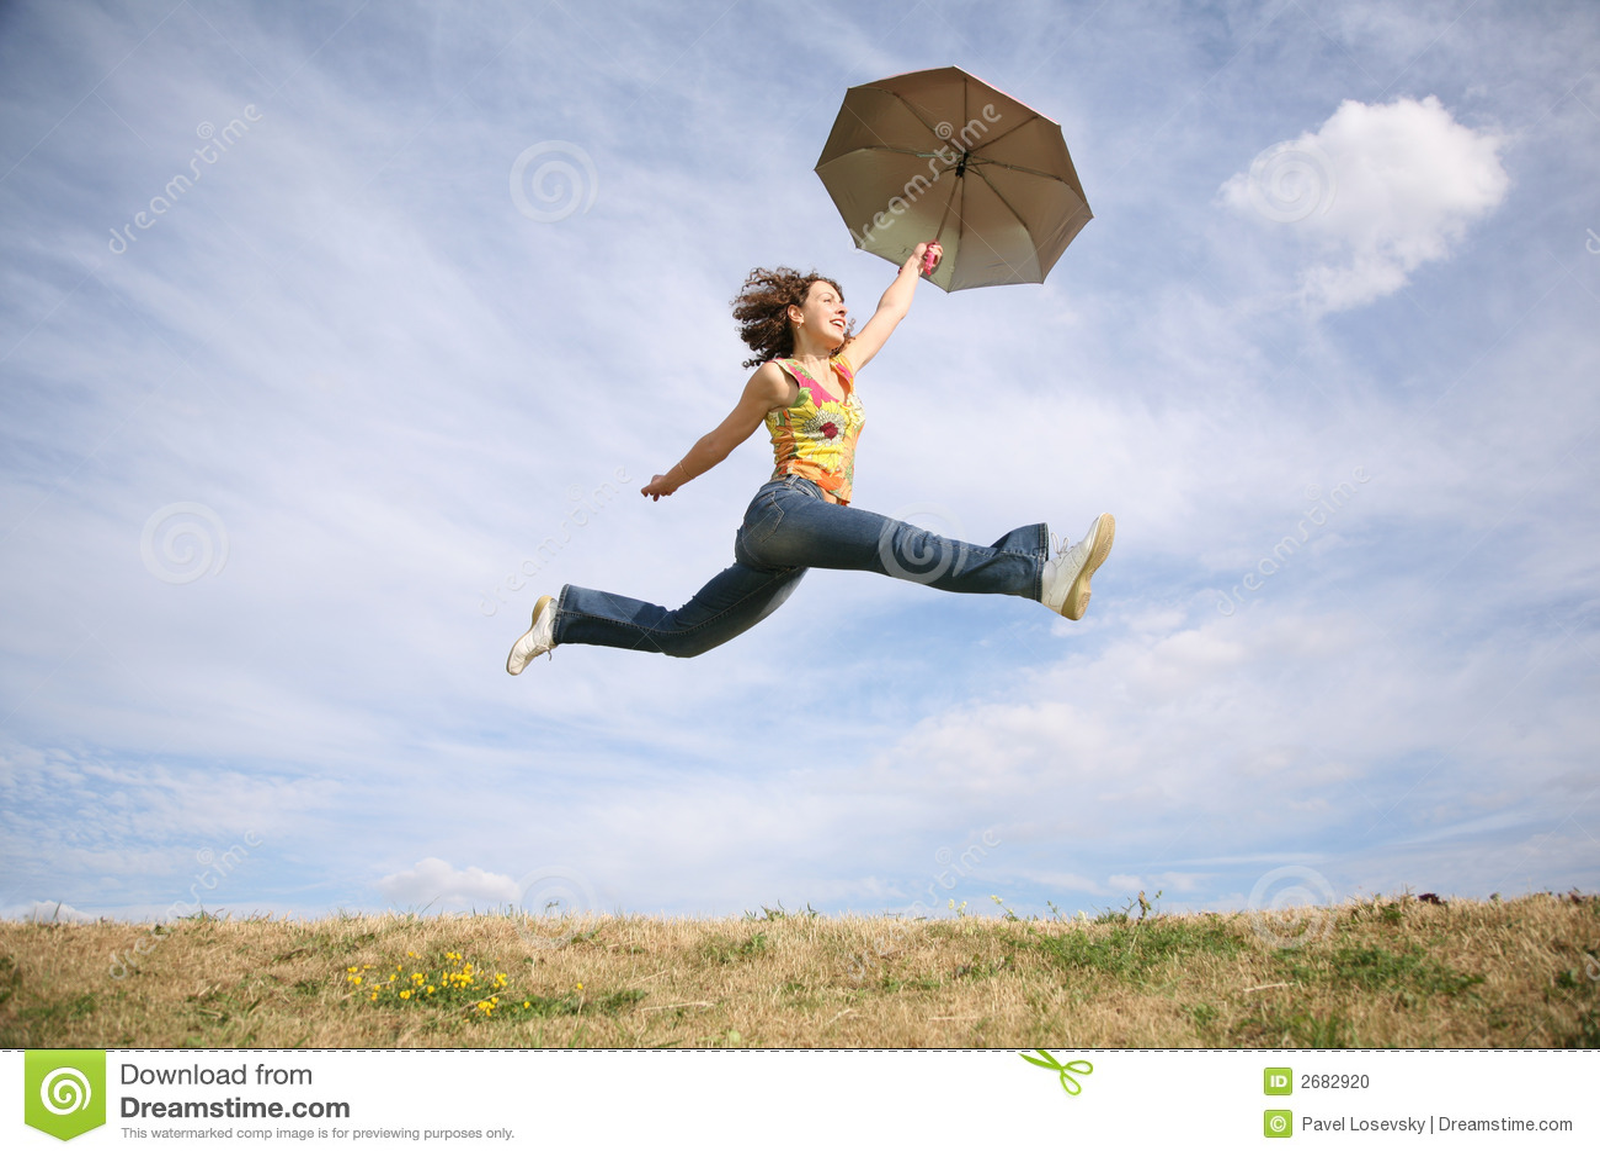 Klipsk paraplykvinna